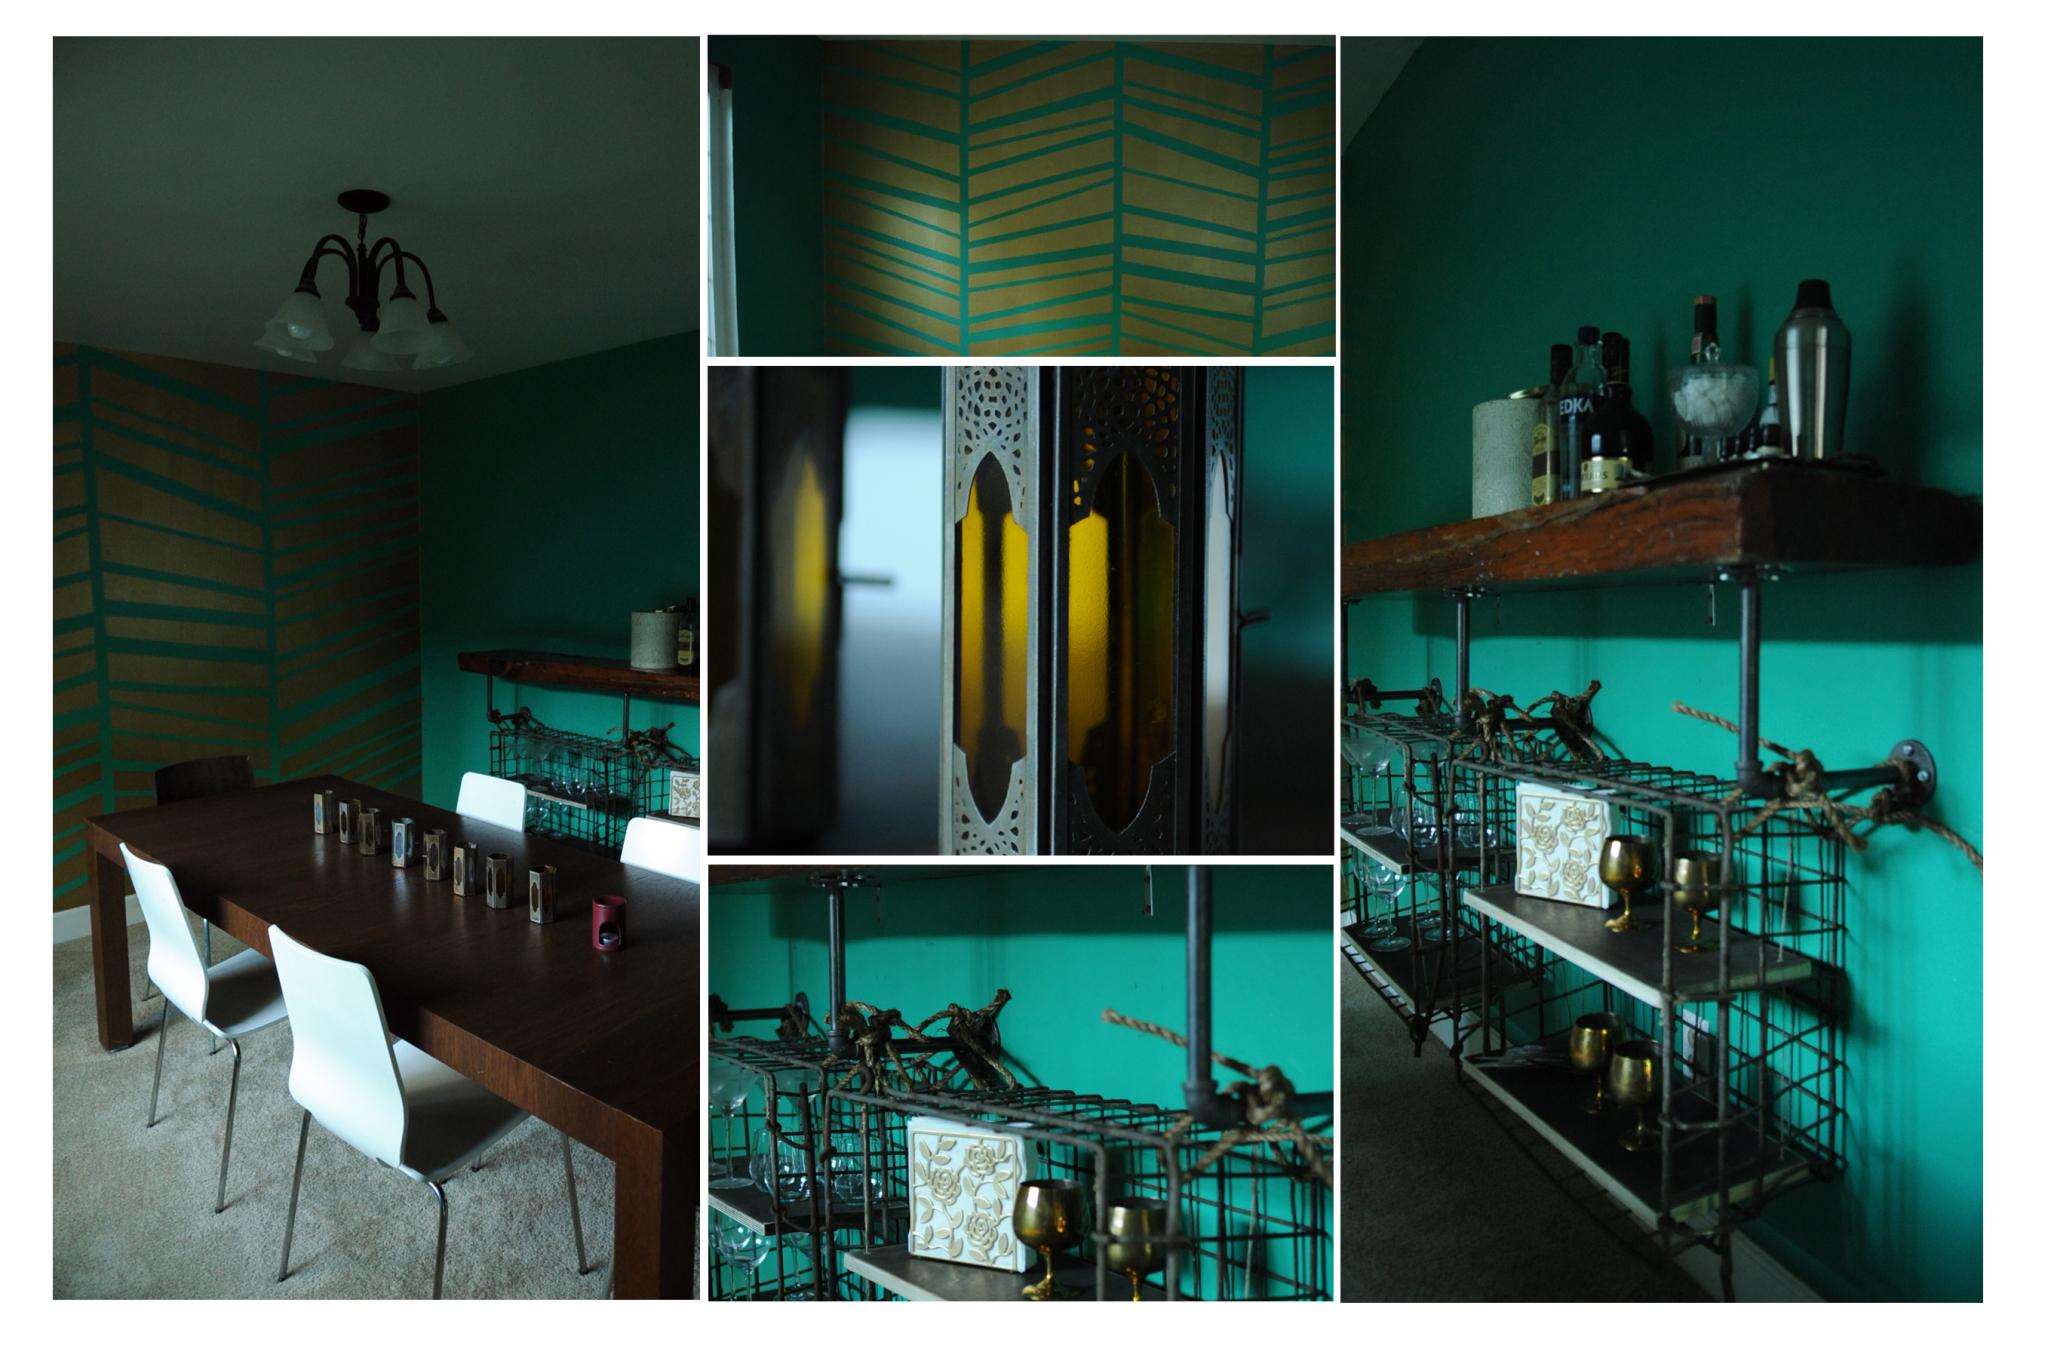 cs_room2.jpg